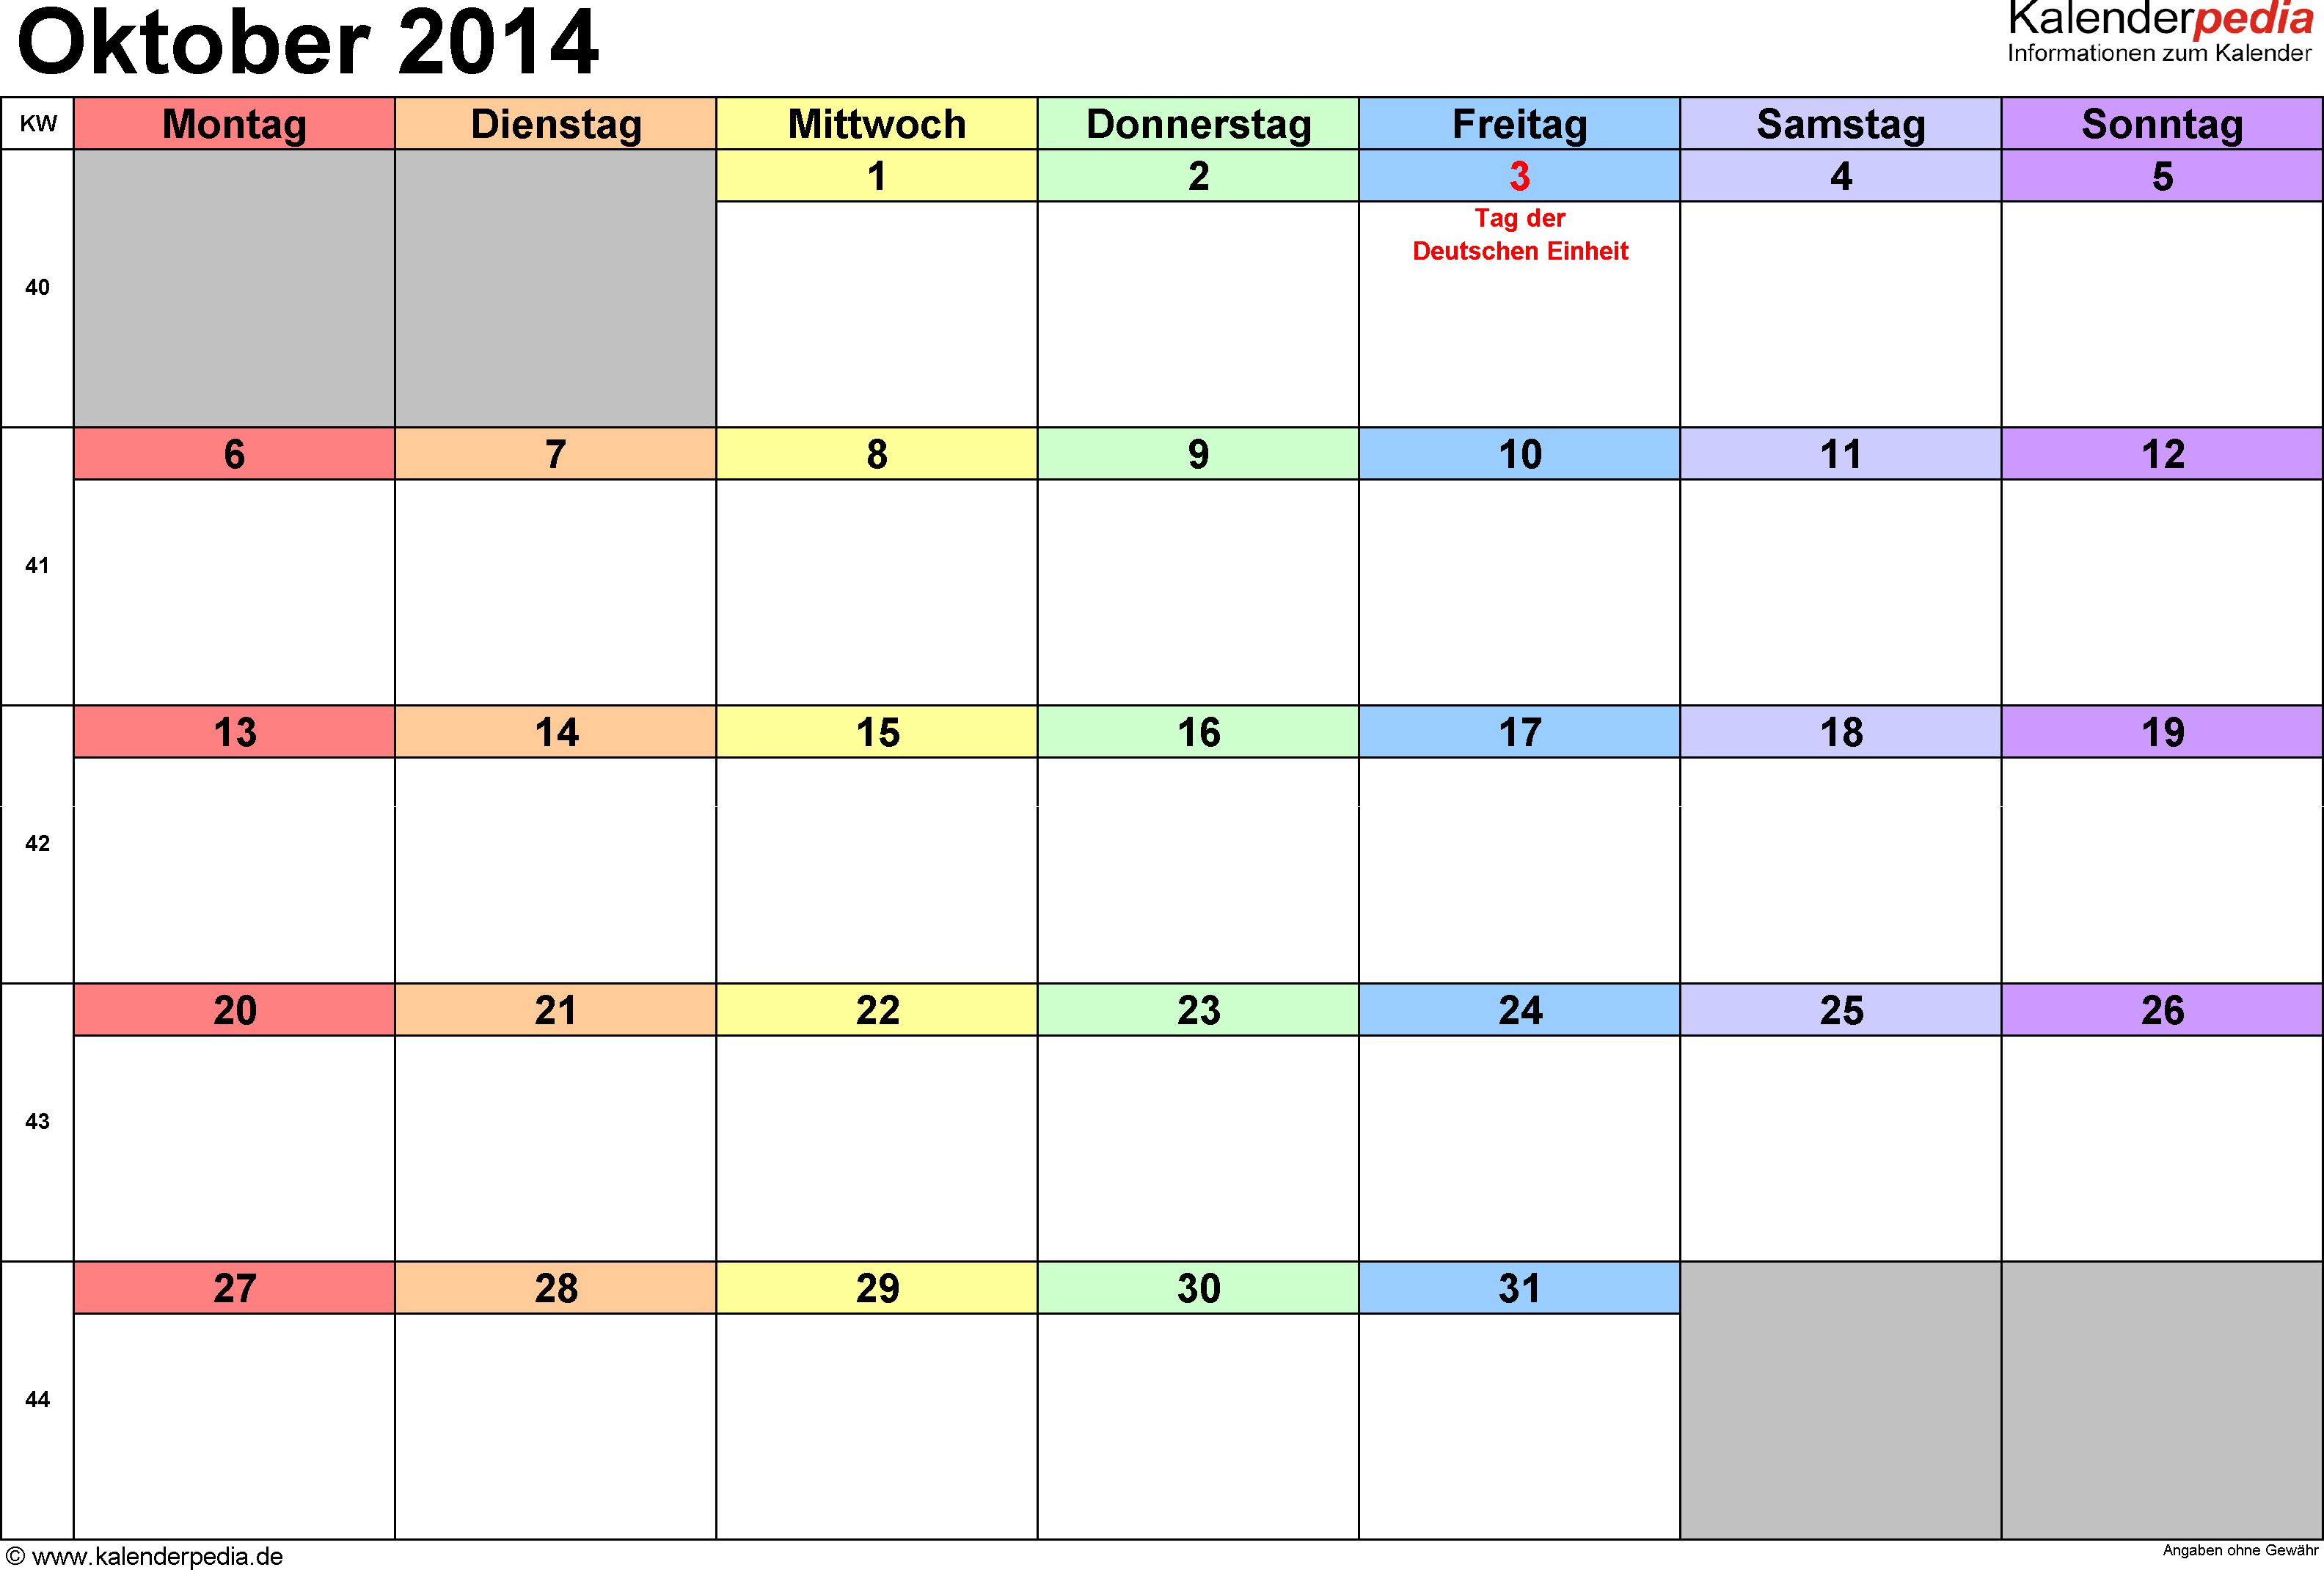 Kalender October 2014 (Querformat) als Word-Vorlage